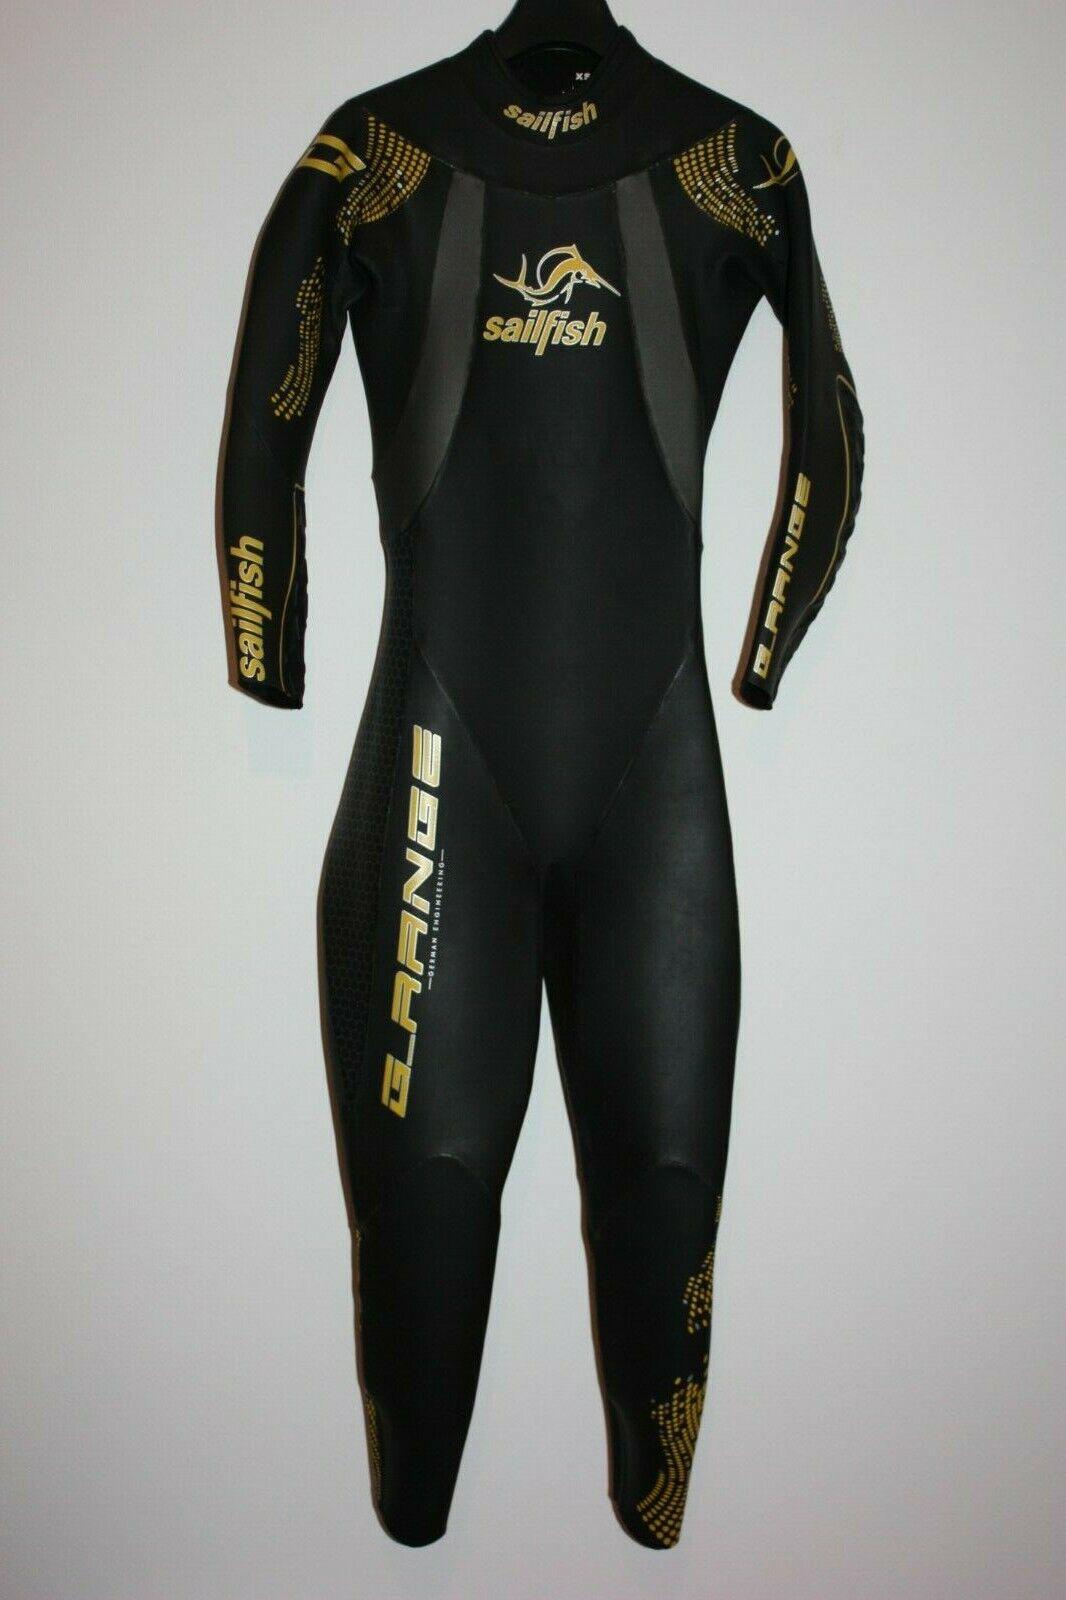 Sailfish G-Range Triathlon Neoprenanzug Gr. XS Neo Wetsuit Orca Xterra 2XU TYR